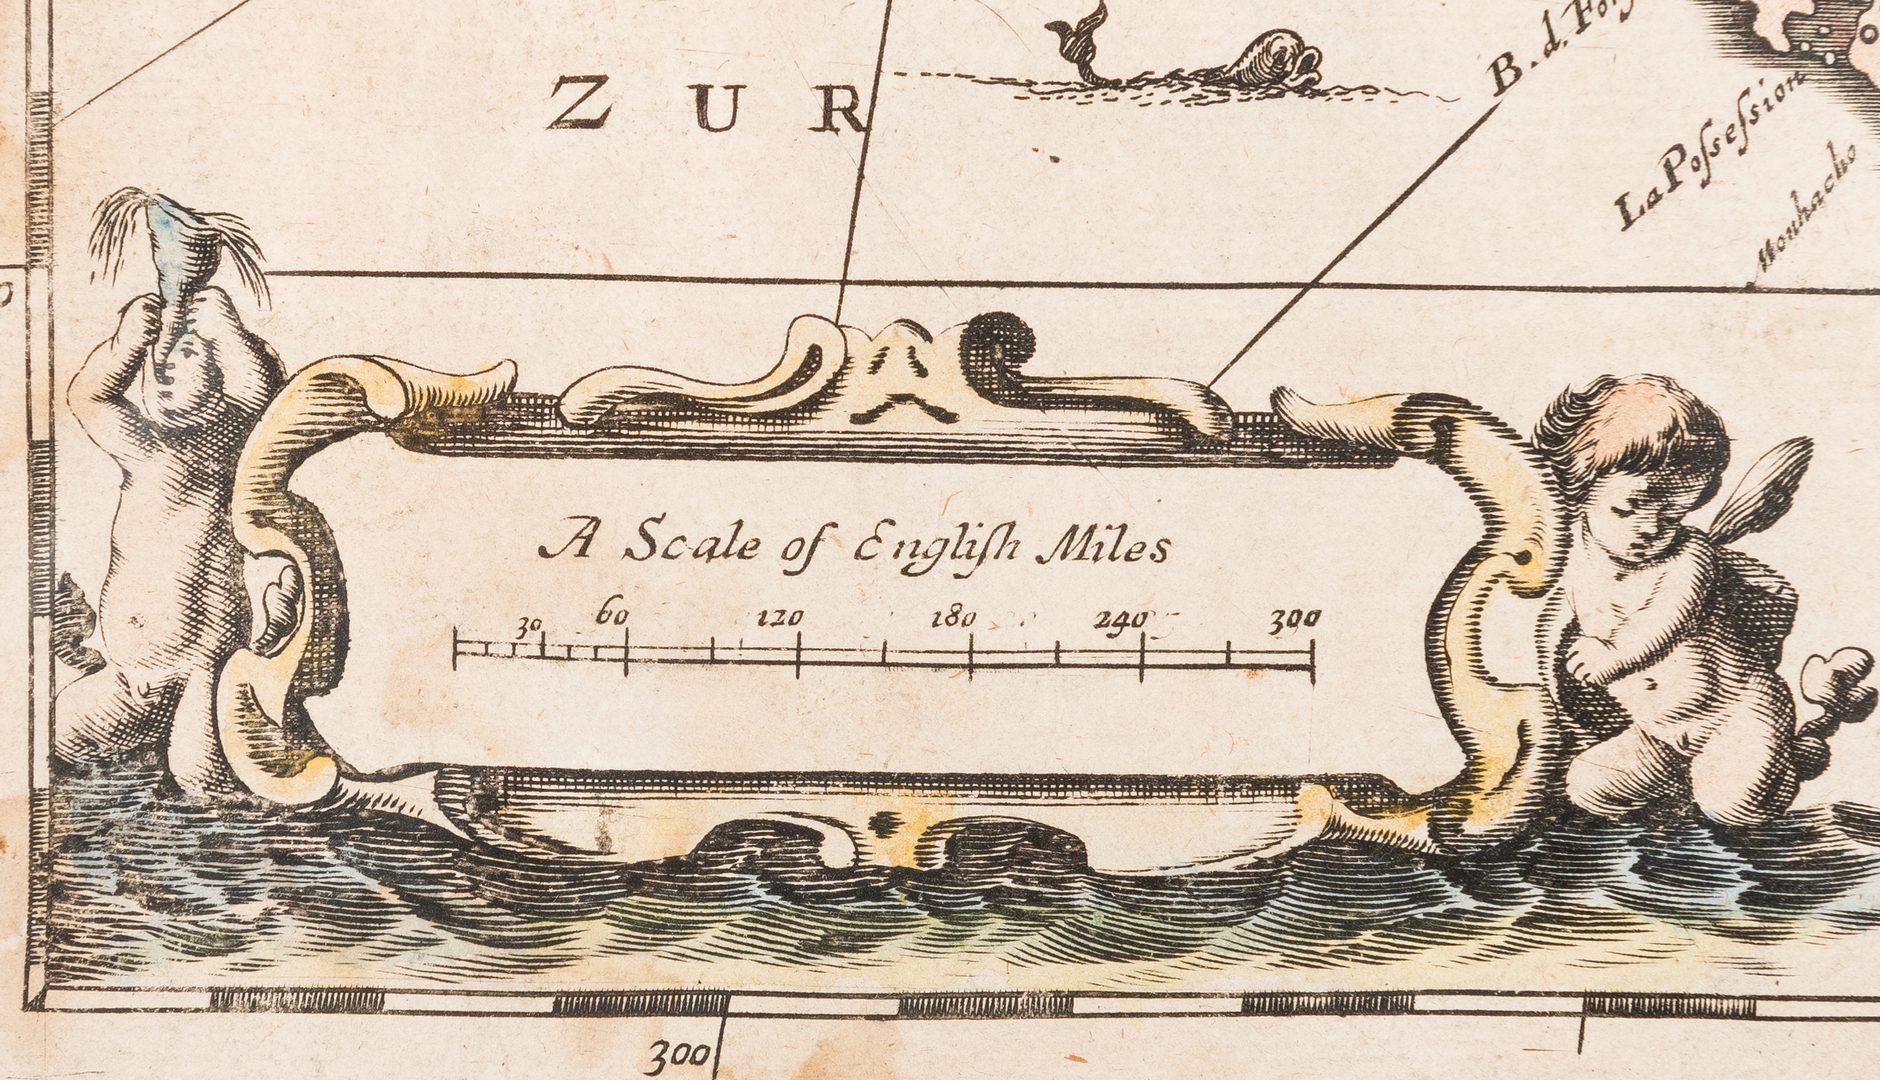 Lot 276: Morden 1673 Virginia Map of English Plantations